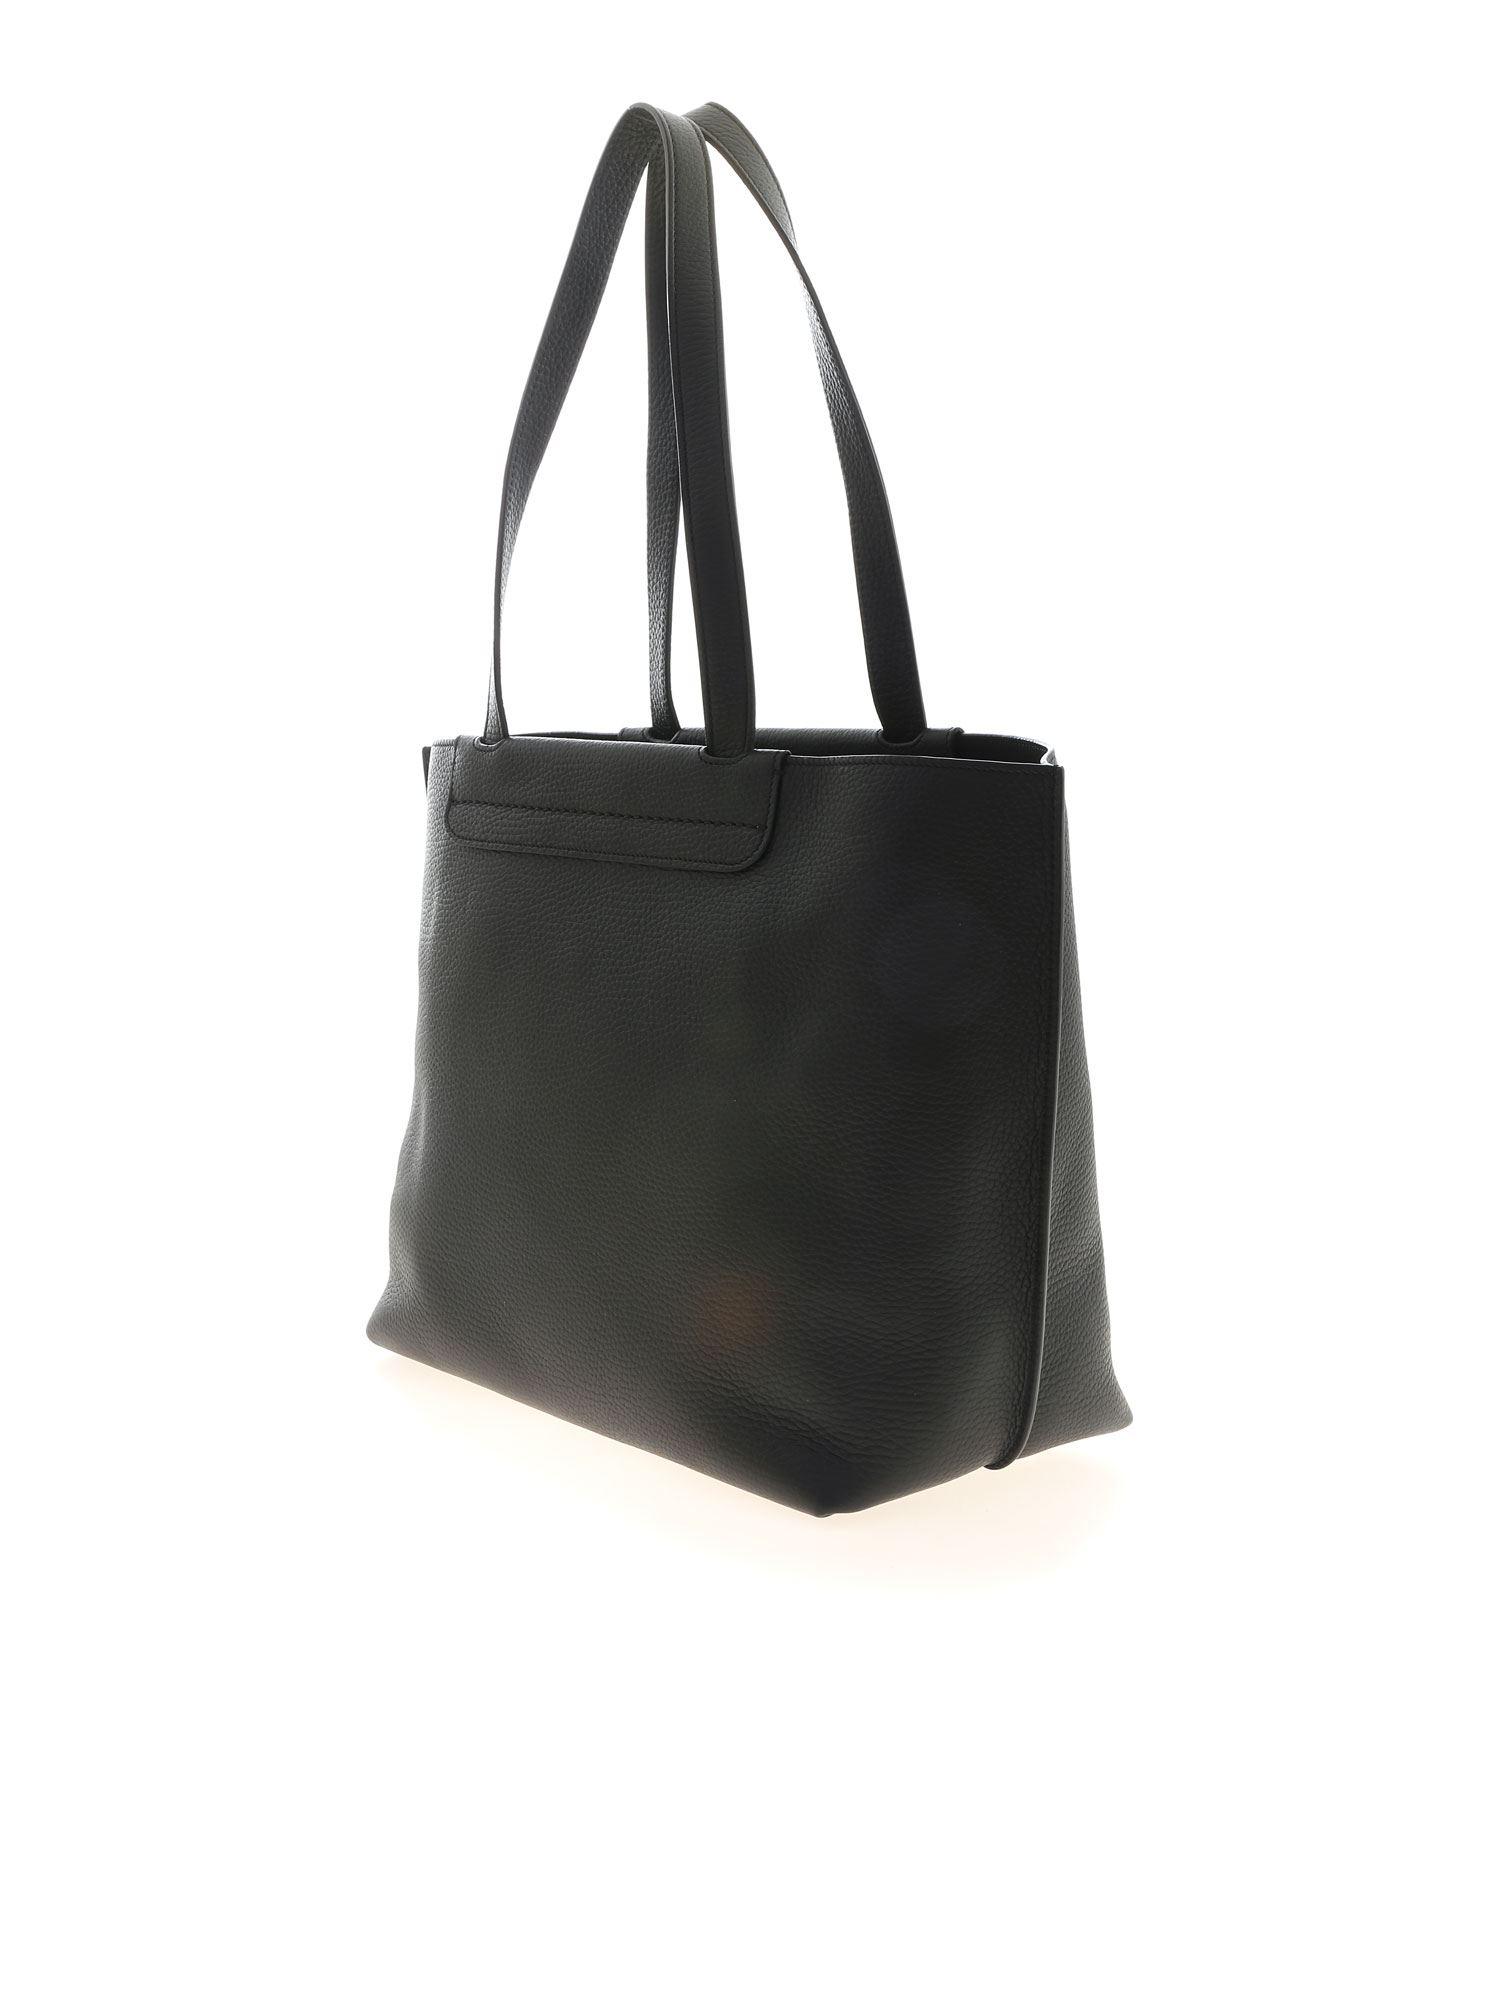 MEDIUM SHOPPER BAG IN BLACK TOD